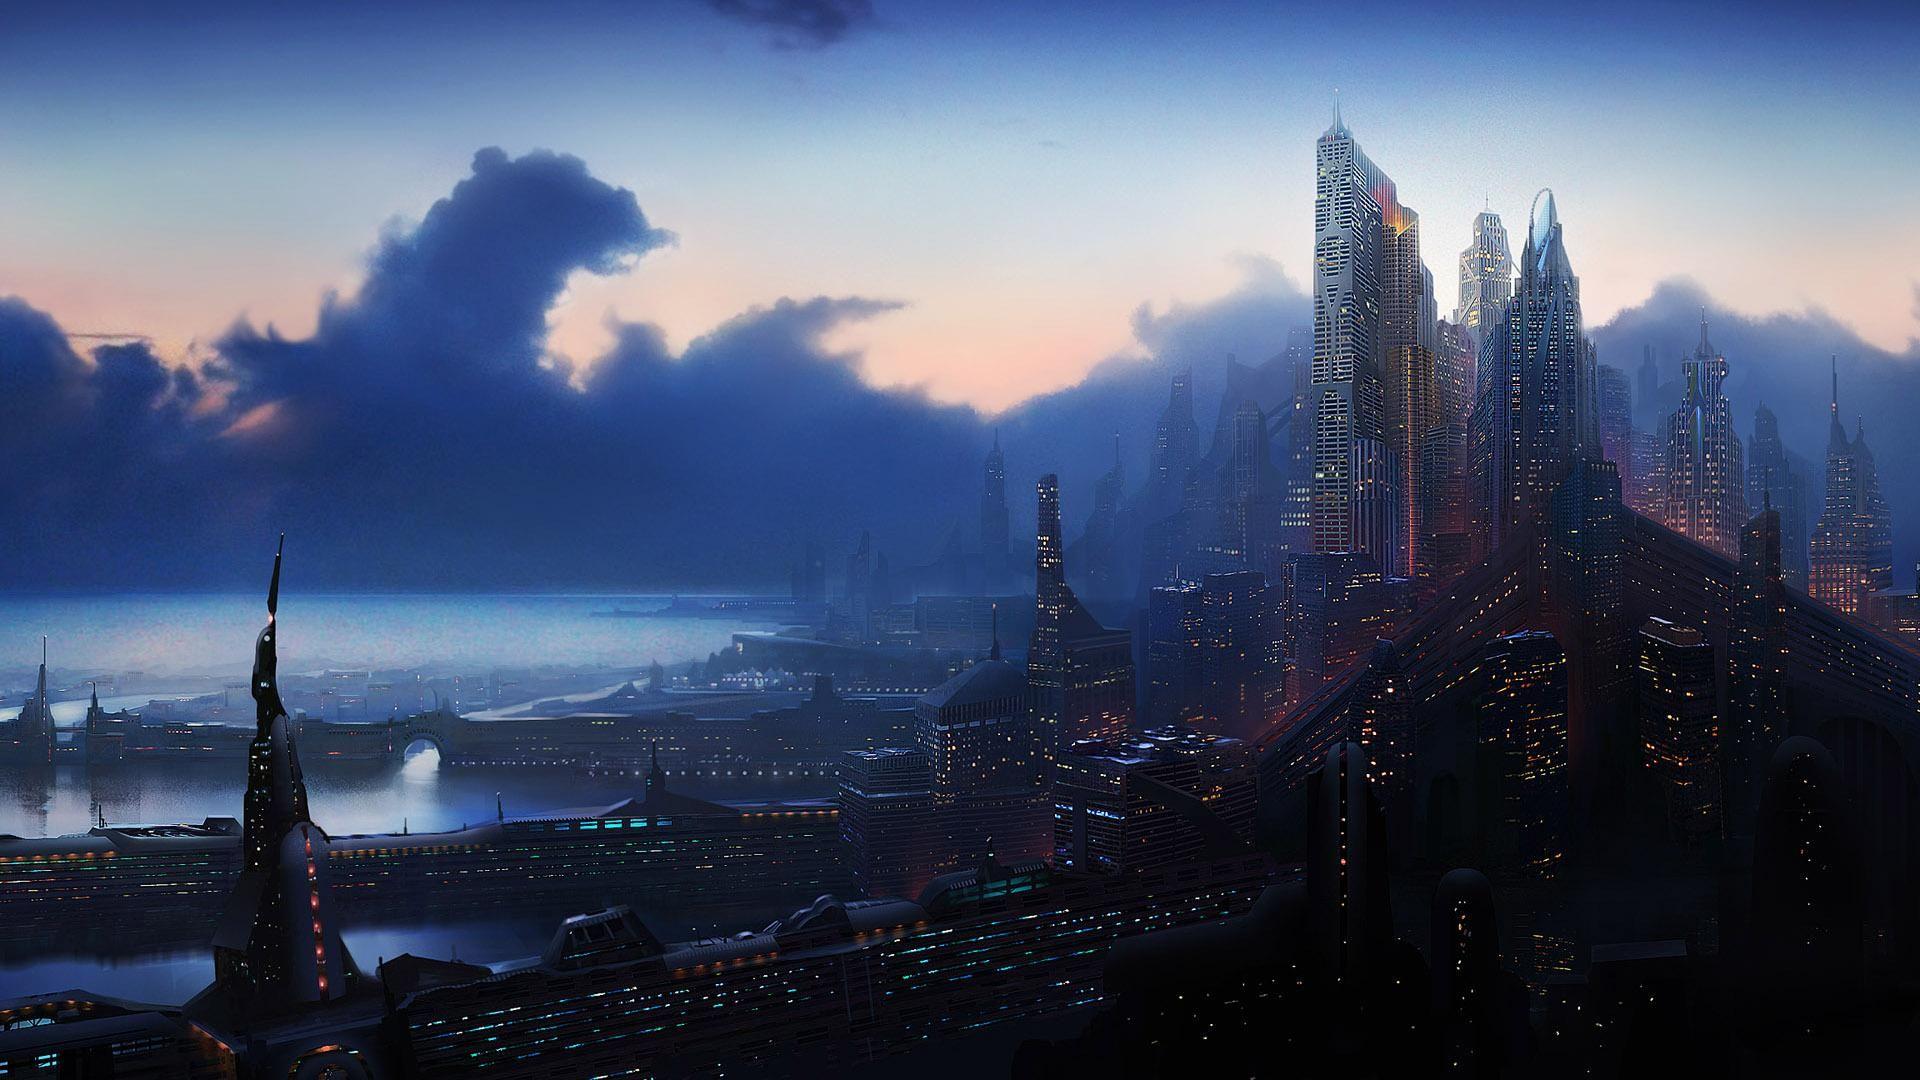 Alien Weyland Yutani Corp Sci Fi City Sci Fi Wallpaper